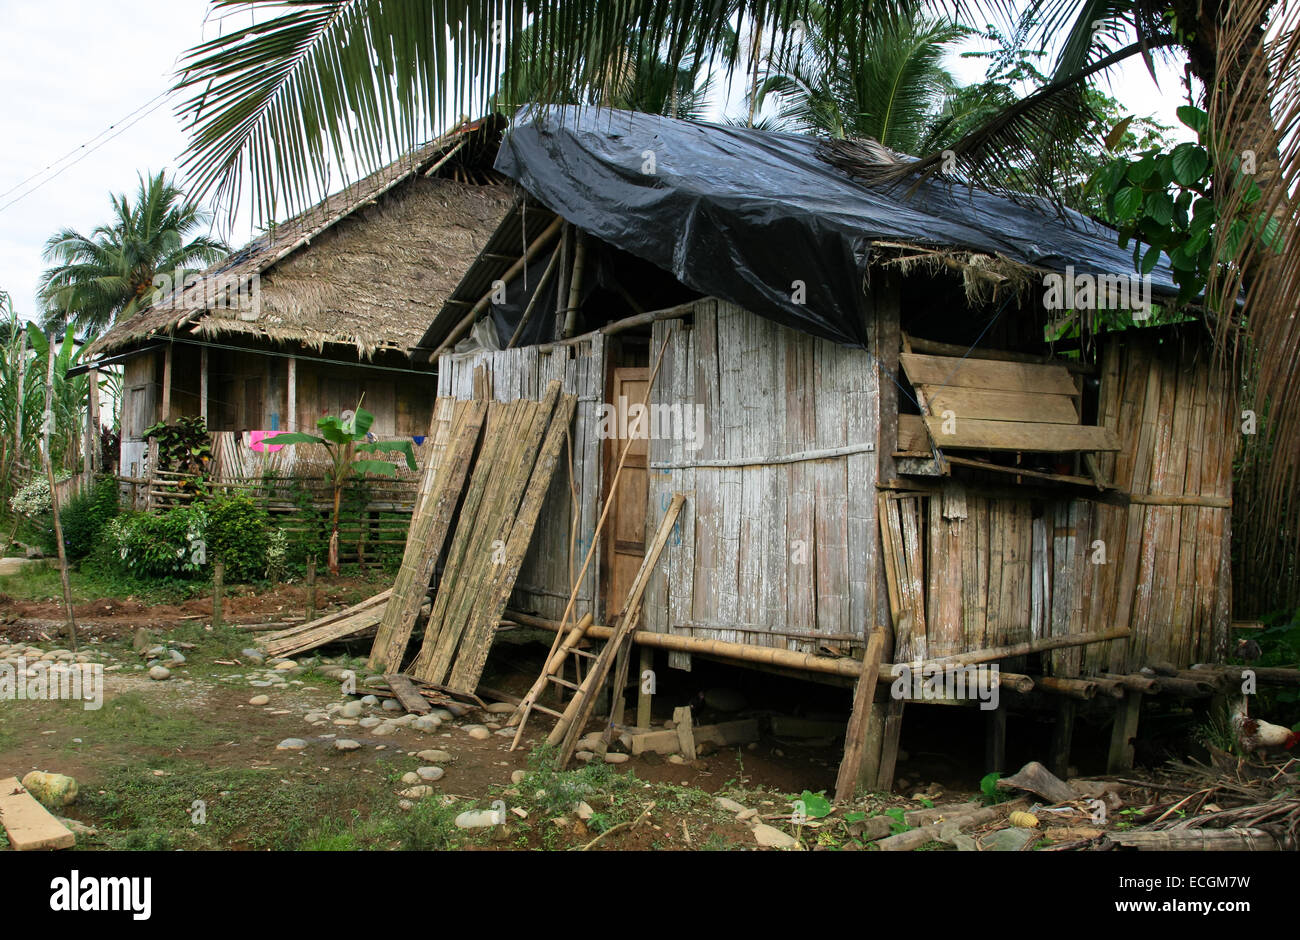 Housing in poverty stricken Ecuador Stock Photo - Alamy